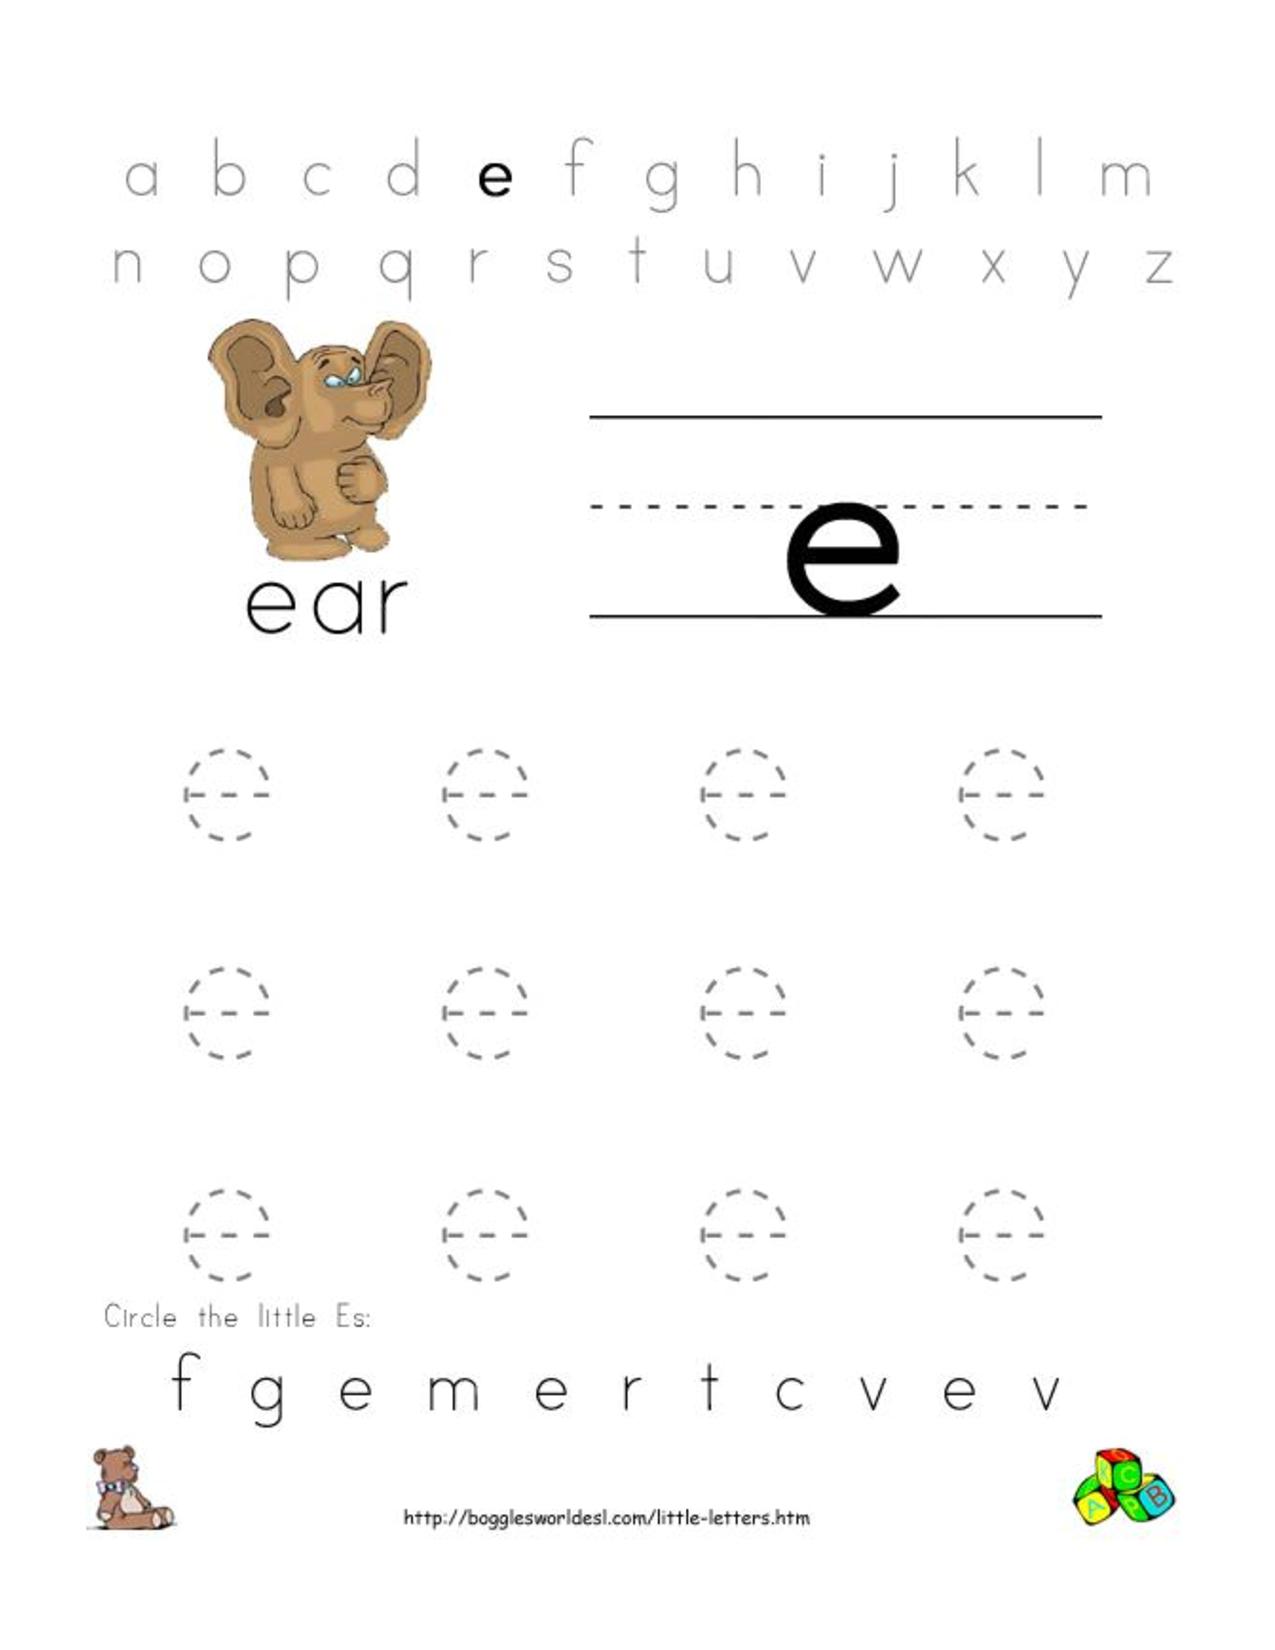 worksheet Letter E Worksheet e worksheet google search worksheets pinterest search